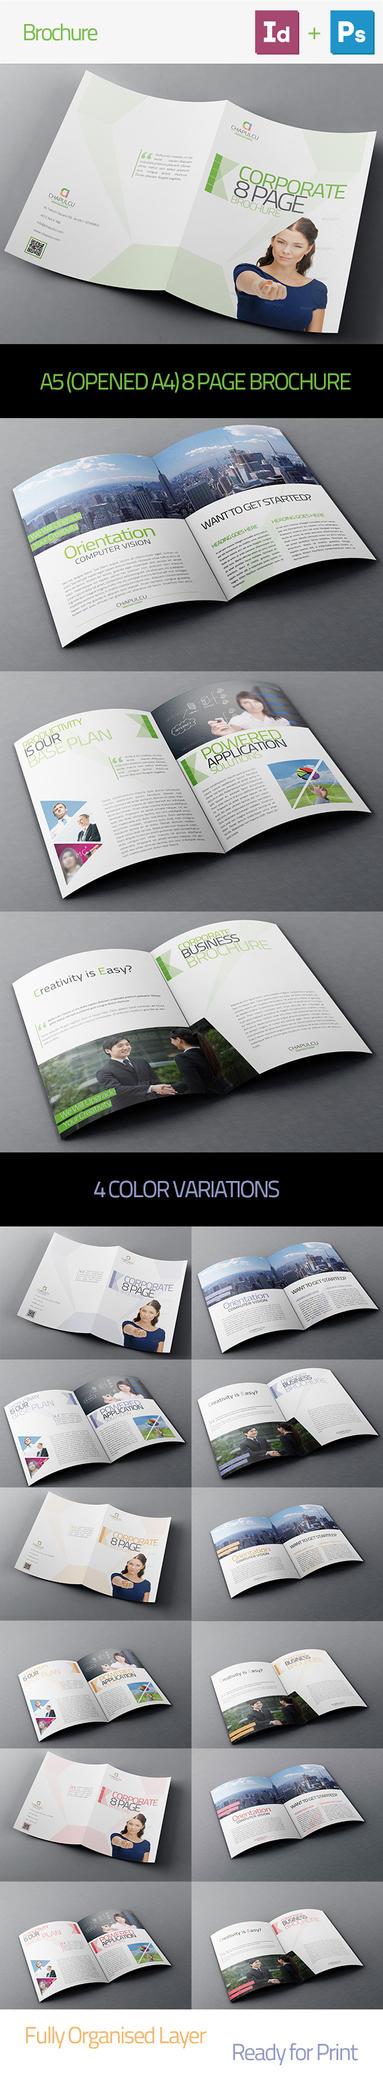 Chapulcu 8 Page Brochure by bakirci